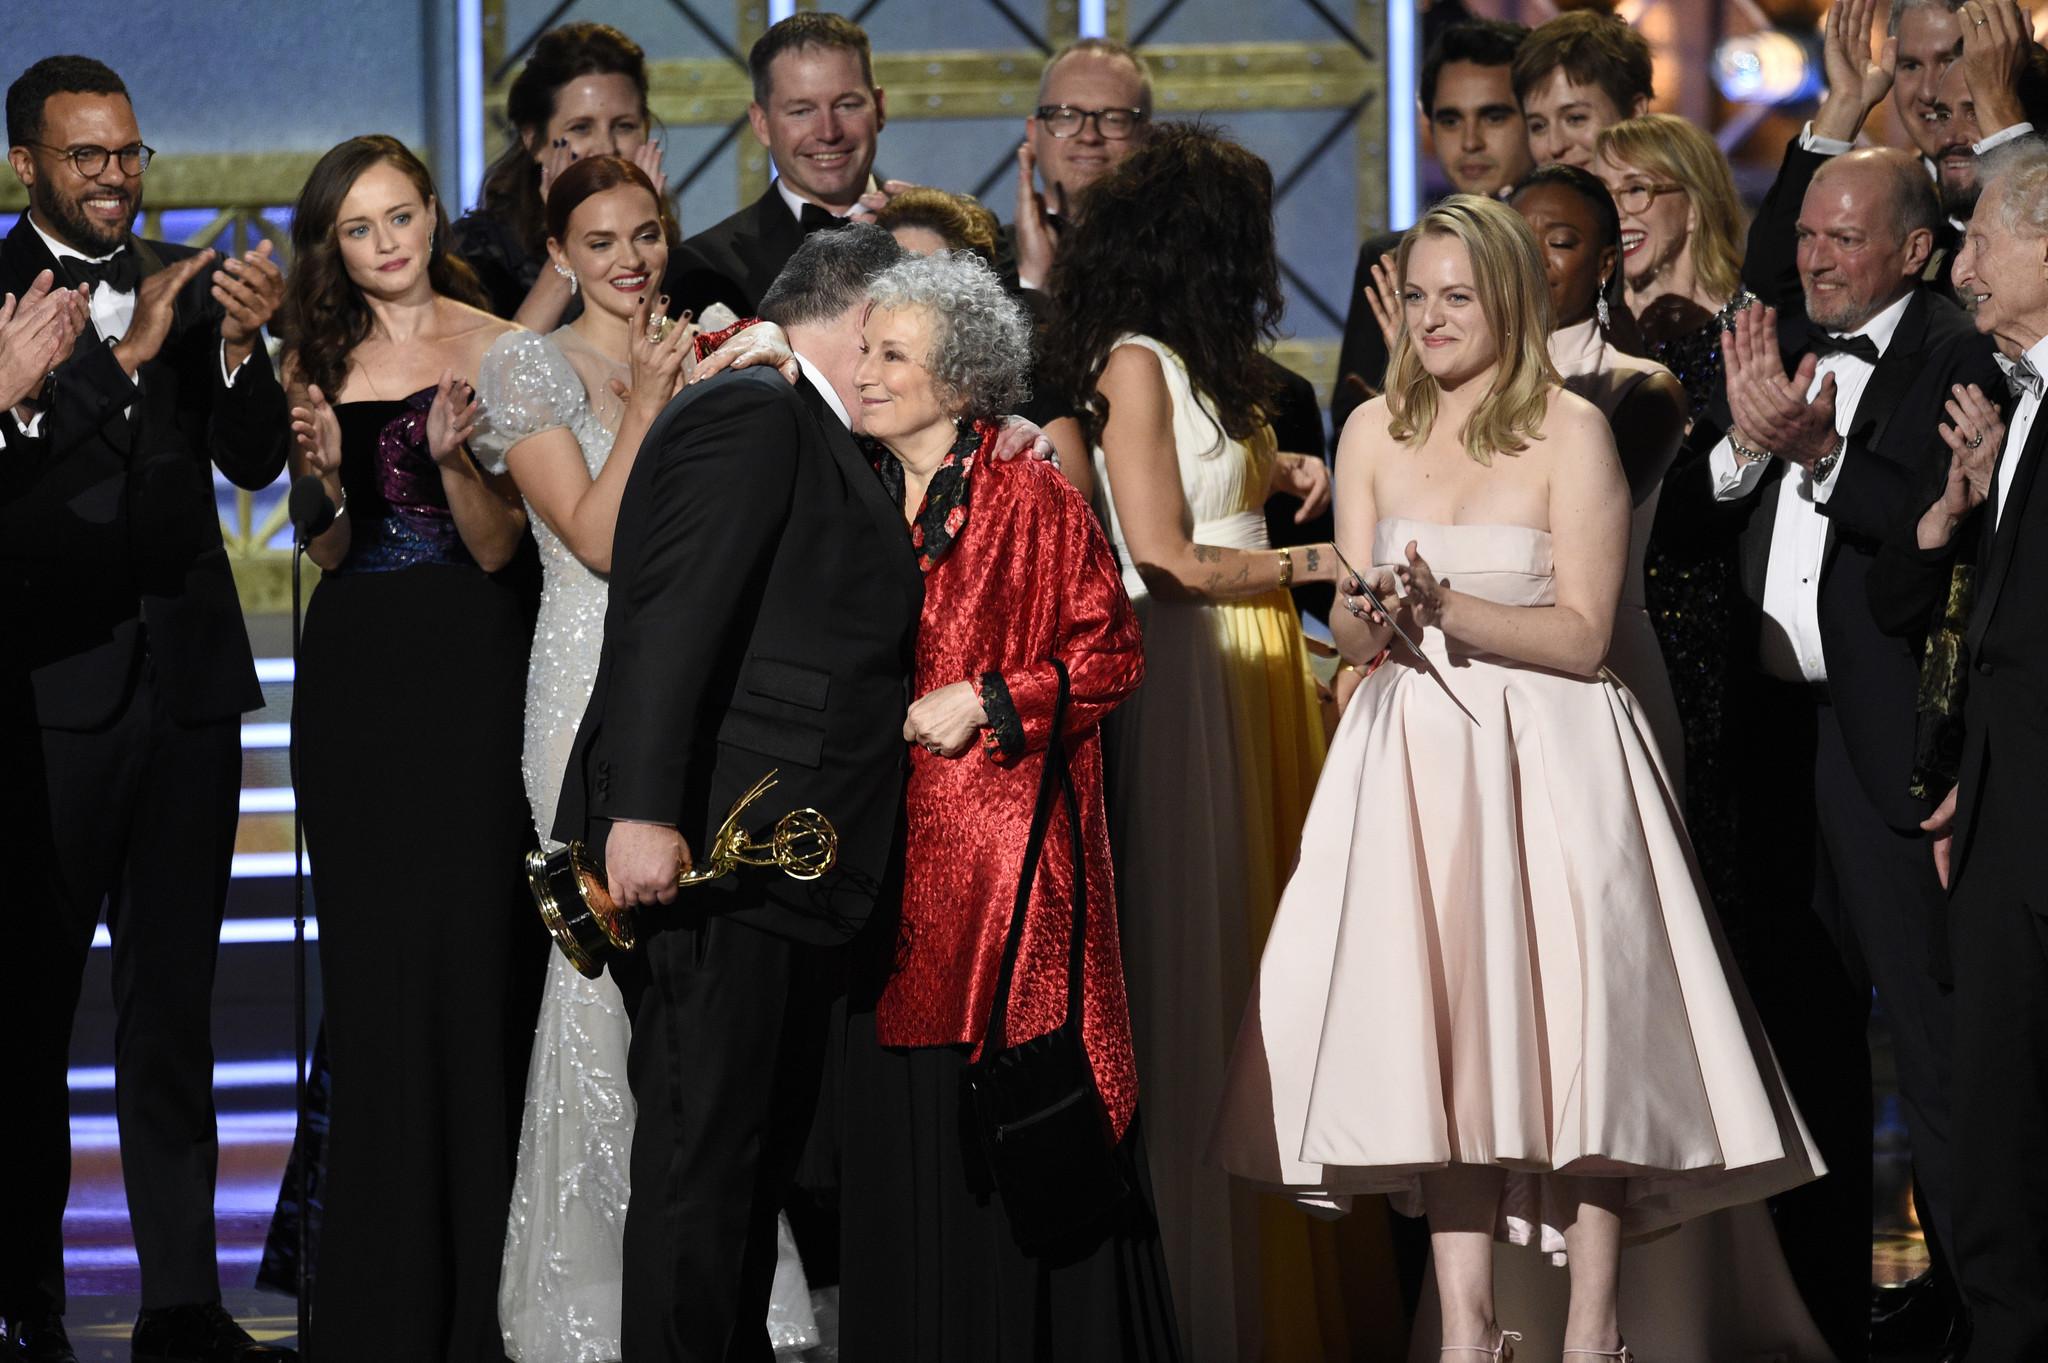 Emmys2017Thehandmaidstale